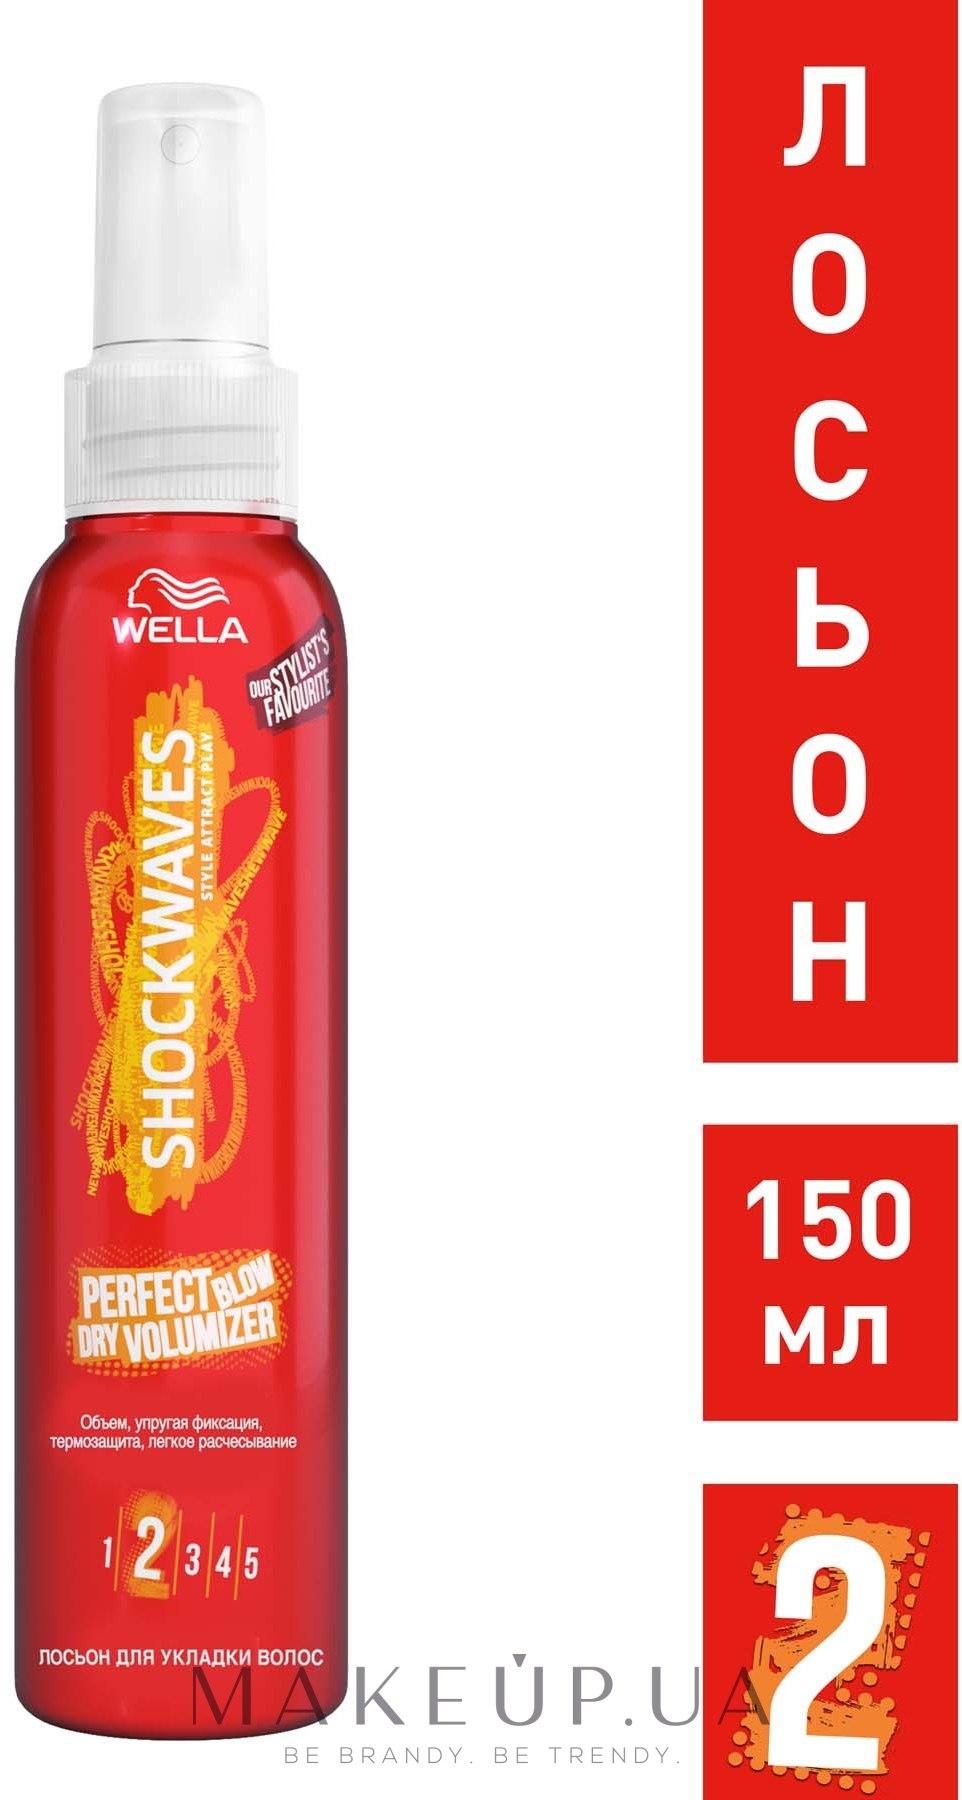 "Лосьон для укладки волос ""Роскошный объем при сушке"" - Wella ShockWaves Perfect Blow Dry Volumizer — фото 150ml"